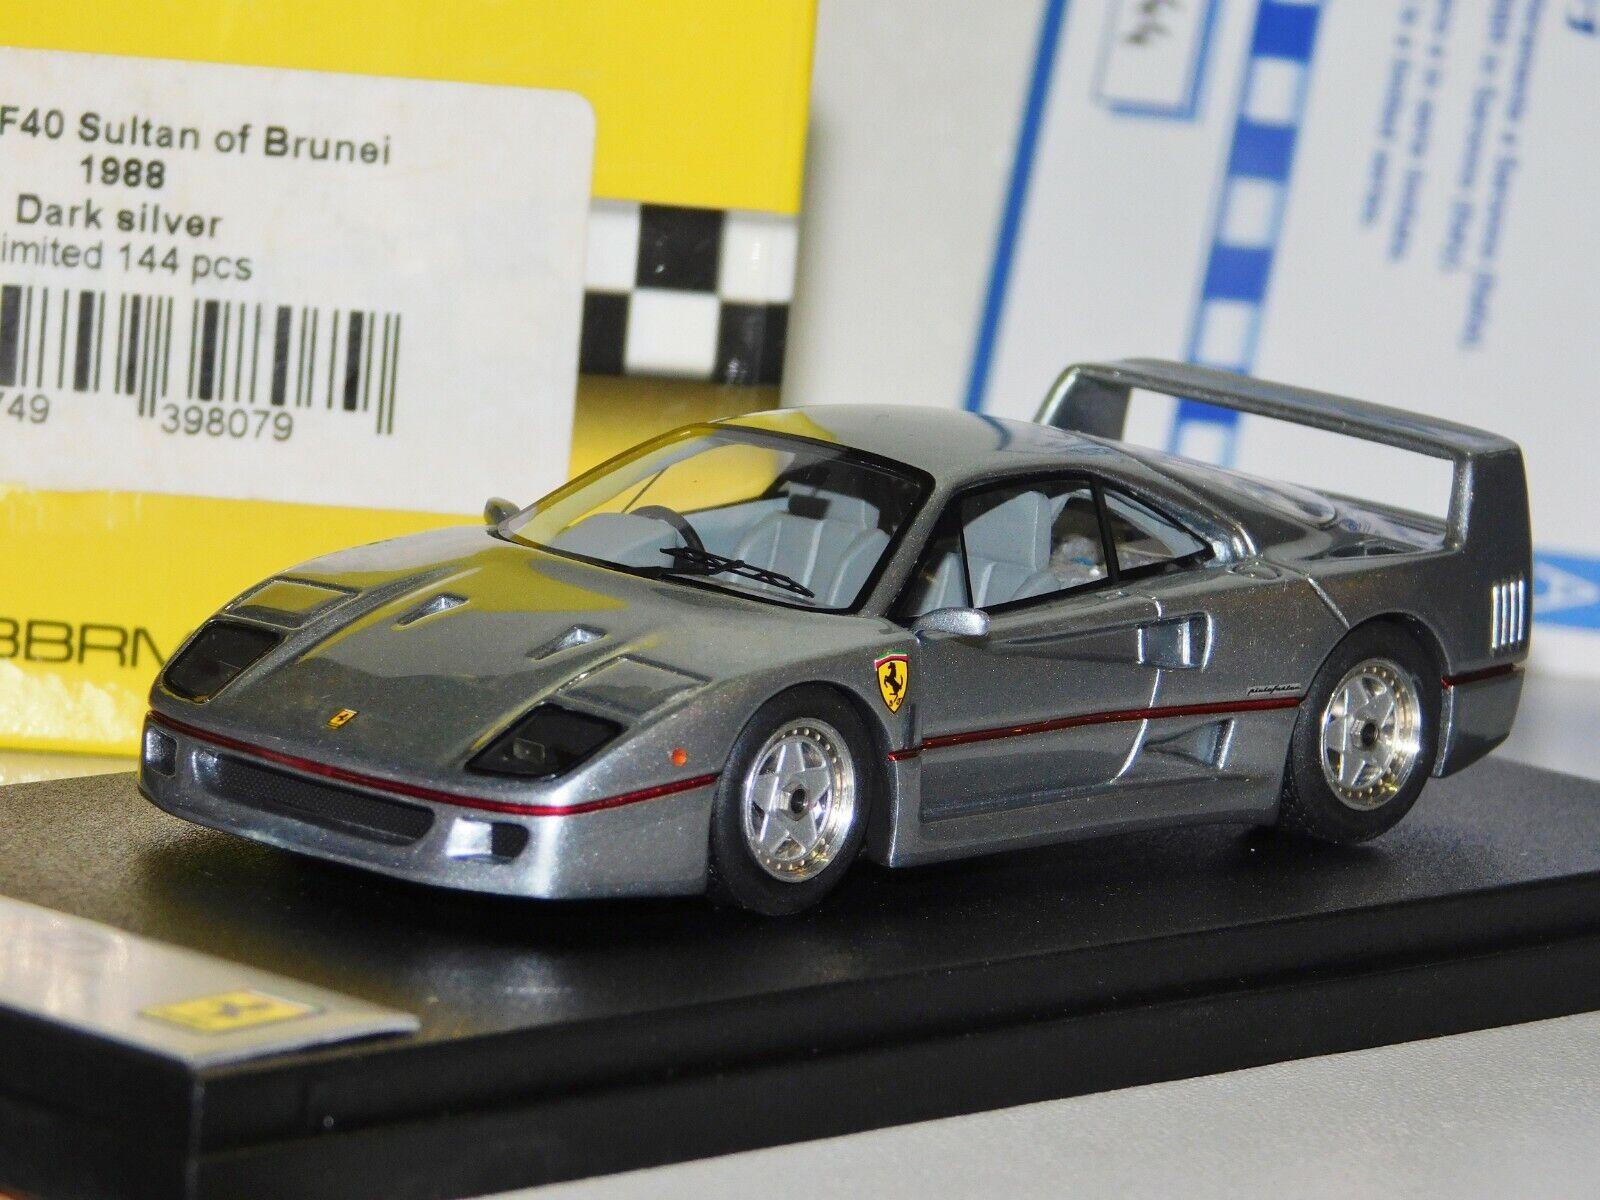 Ferrari F40 1988 Oscuro Plateado Brunei sultán Lim. BBR BG336 1 43